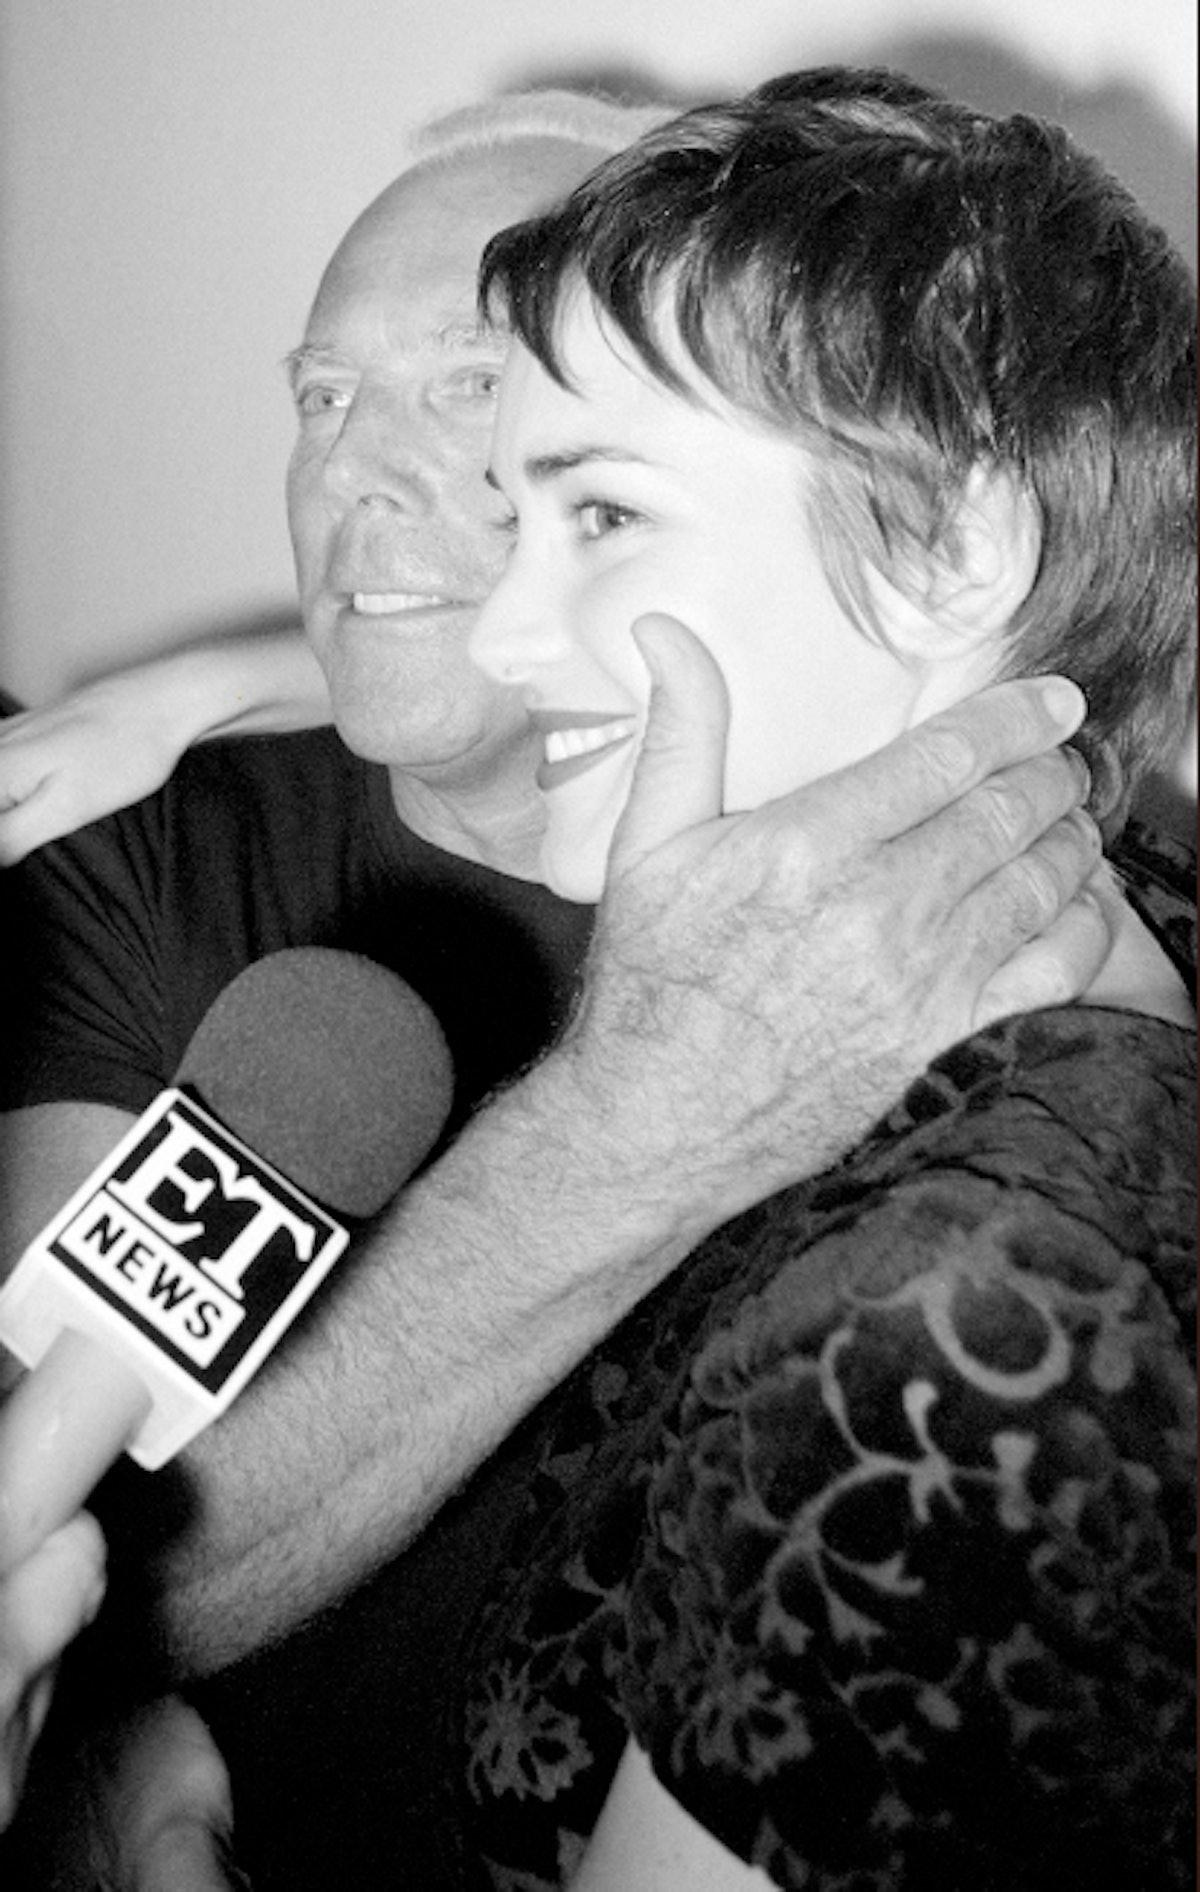 Giorgio Armani and Winona Ryder